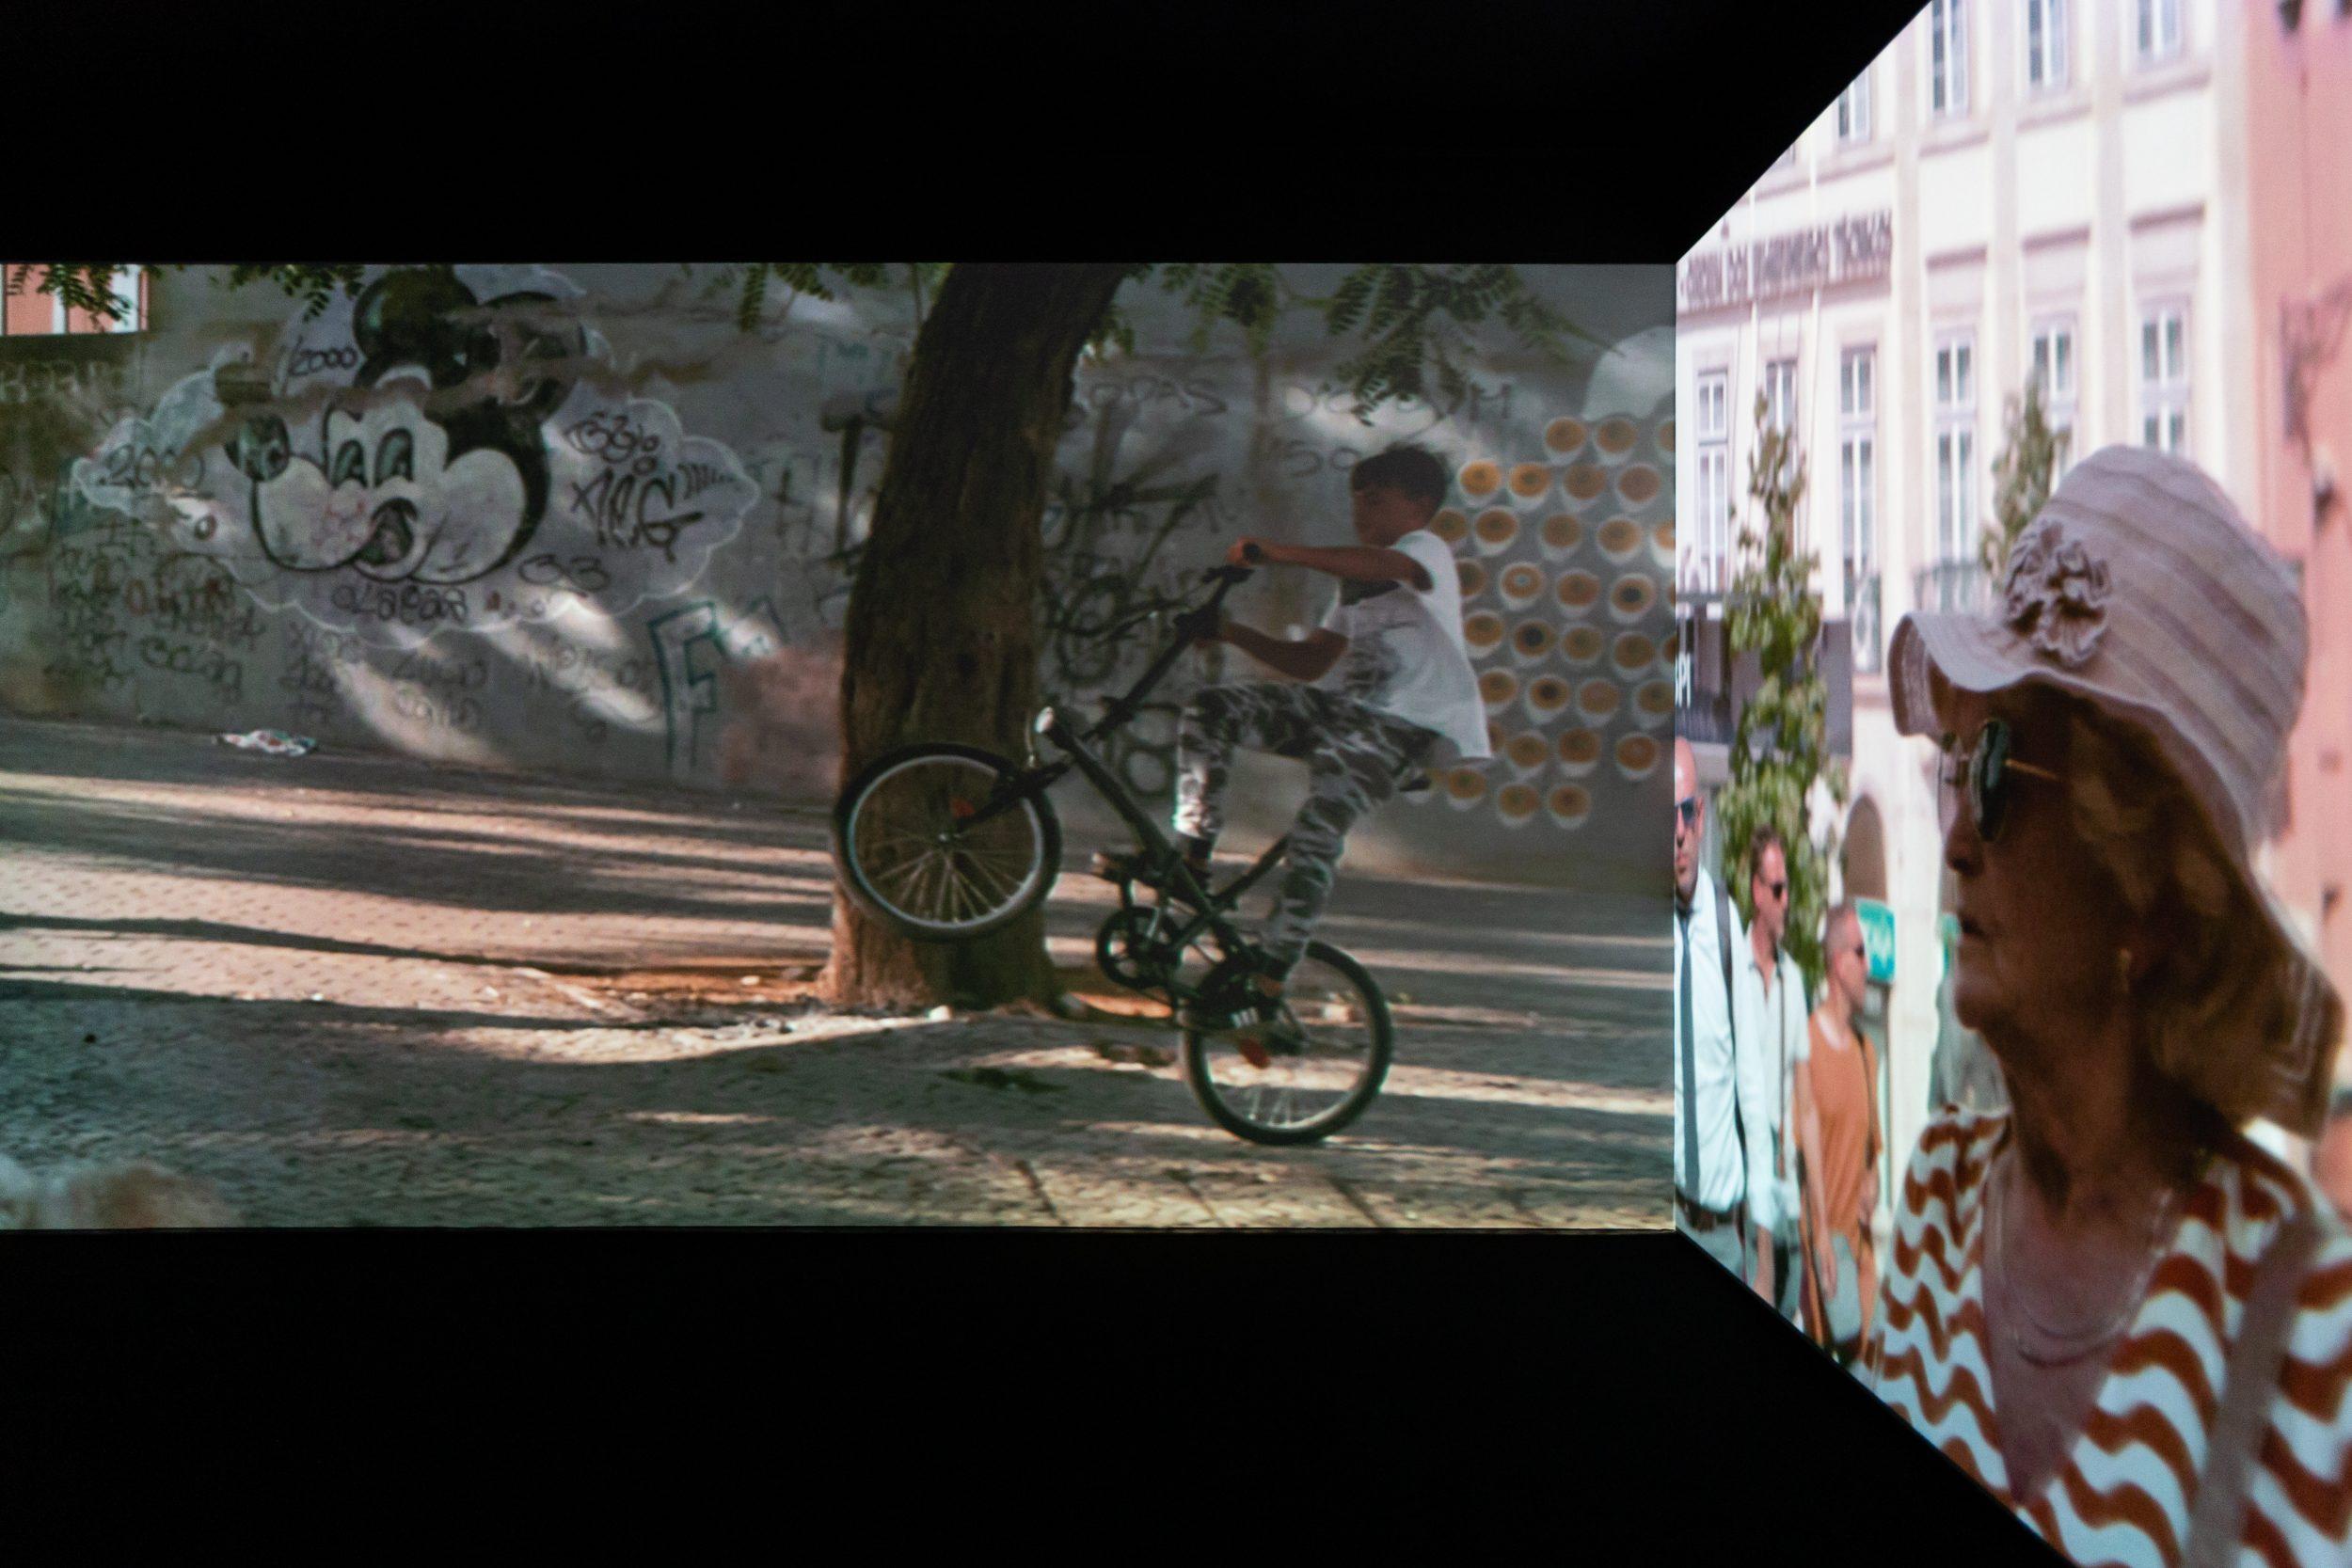 Exhibition view: Fenestra Alexandre Farto aka Vhils Galeria Vera Cortês 2021